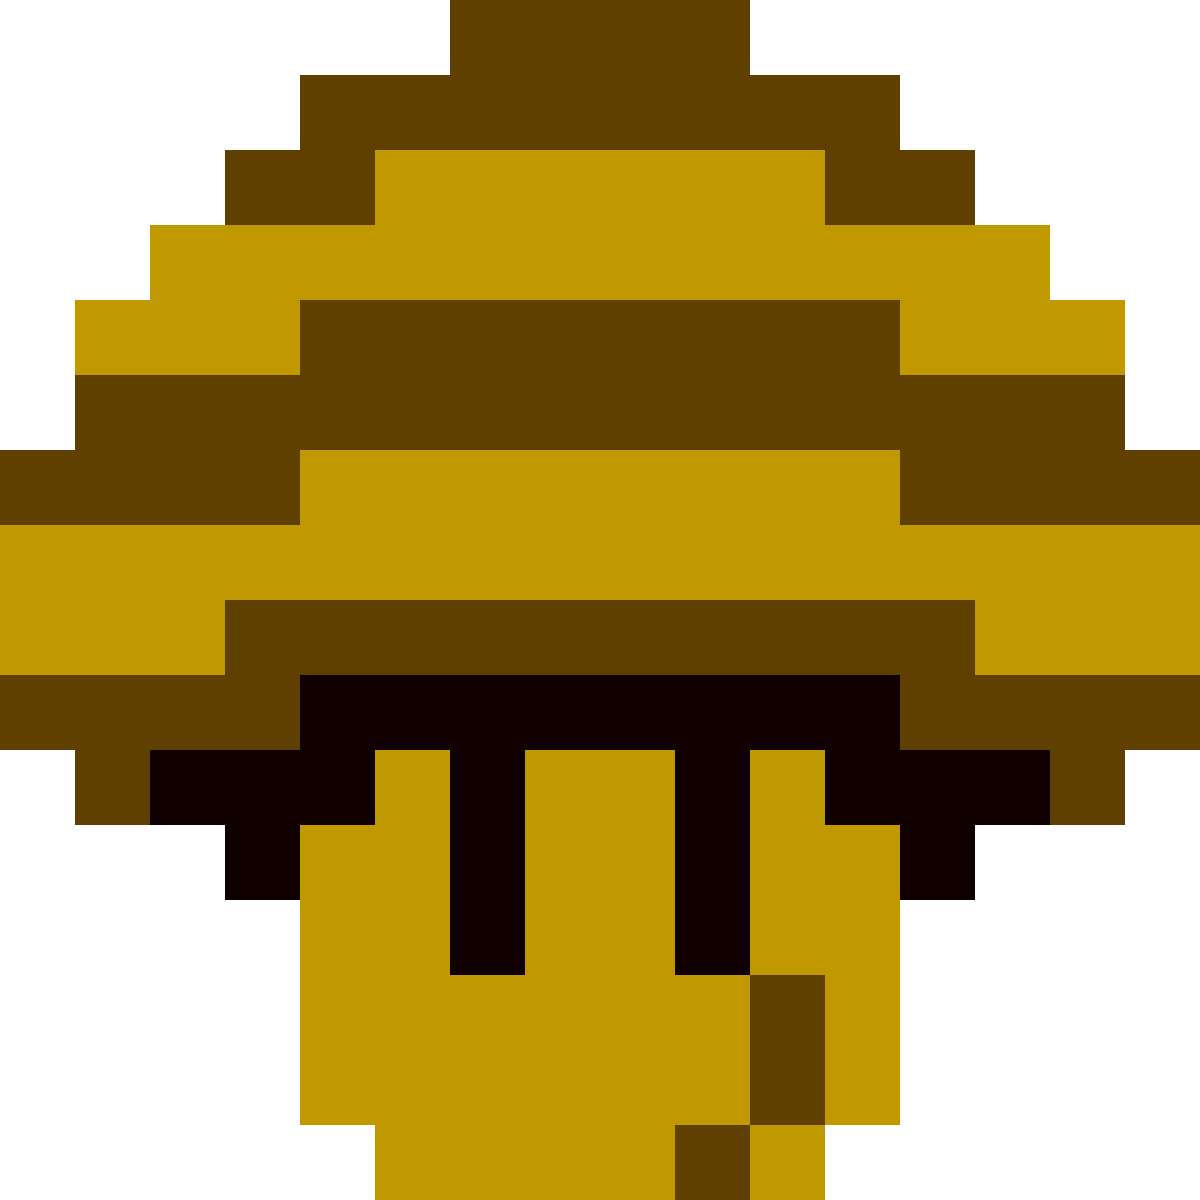 Bee Mushroom from Super Mario Galaxy (NES-style) by Chikorita-Lover